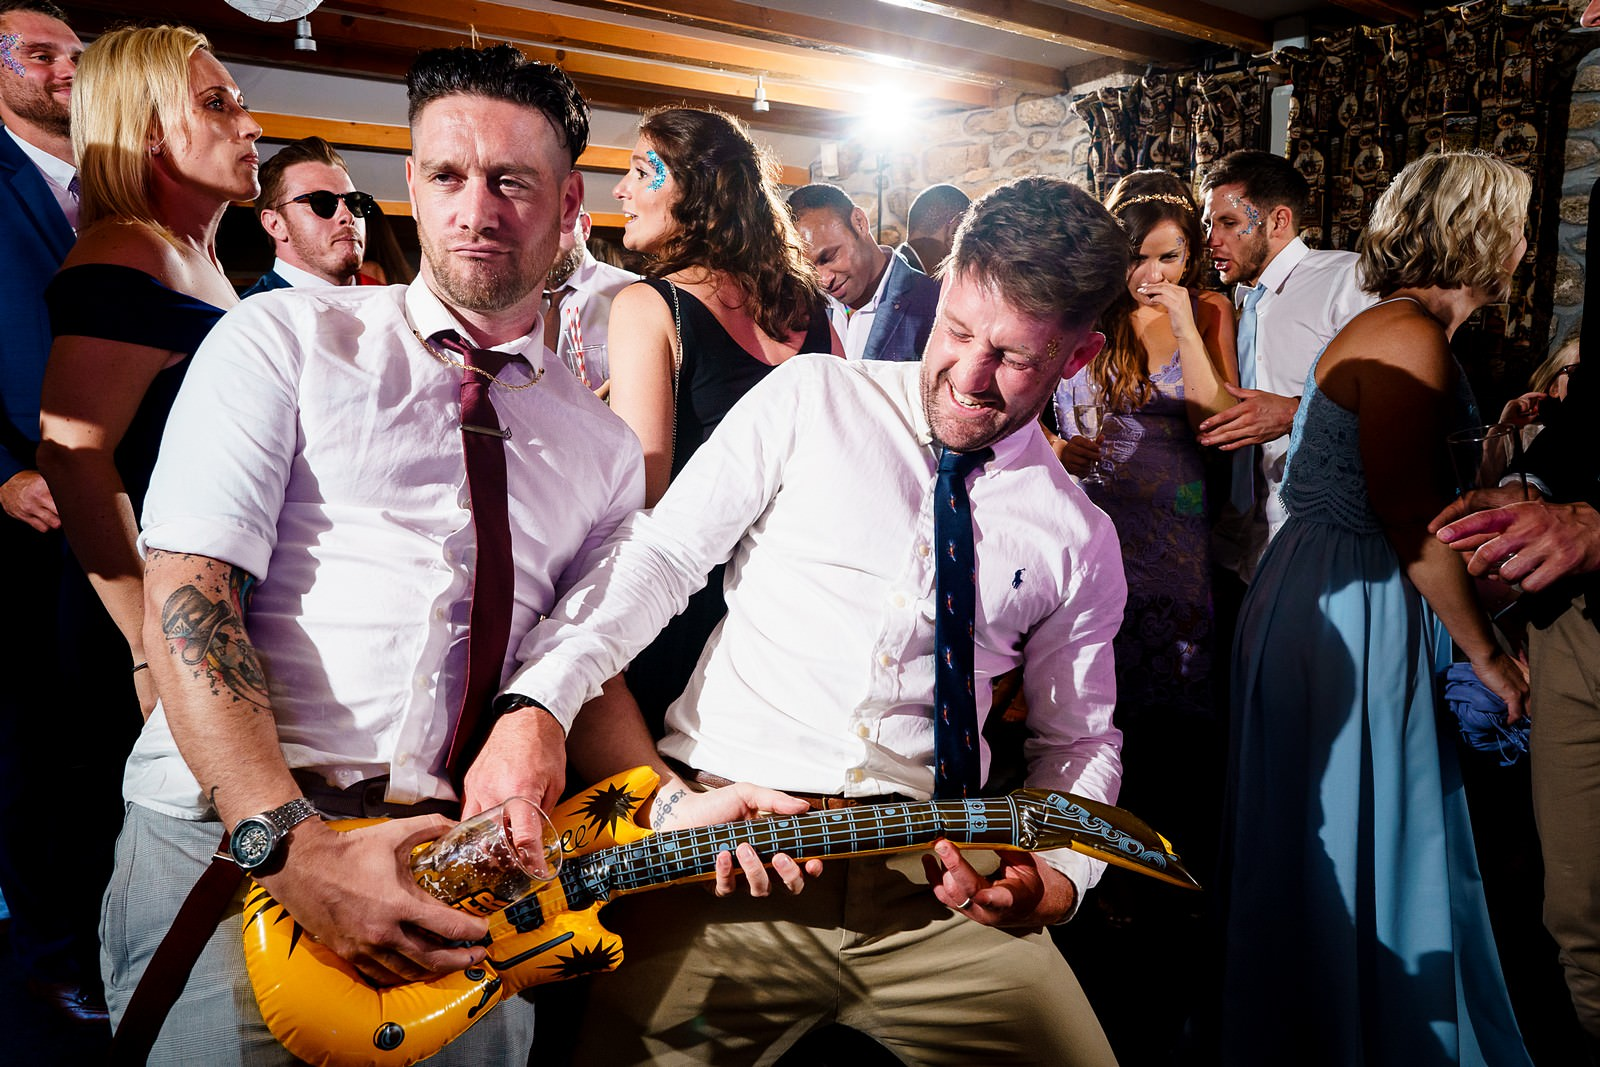 crazy dance floor at knightor winery 110